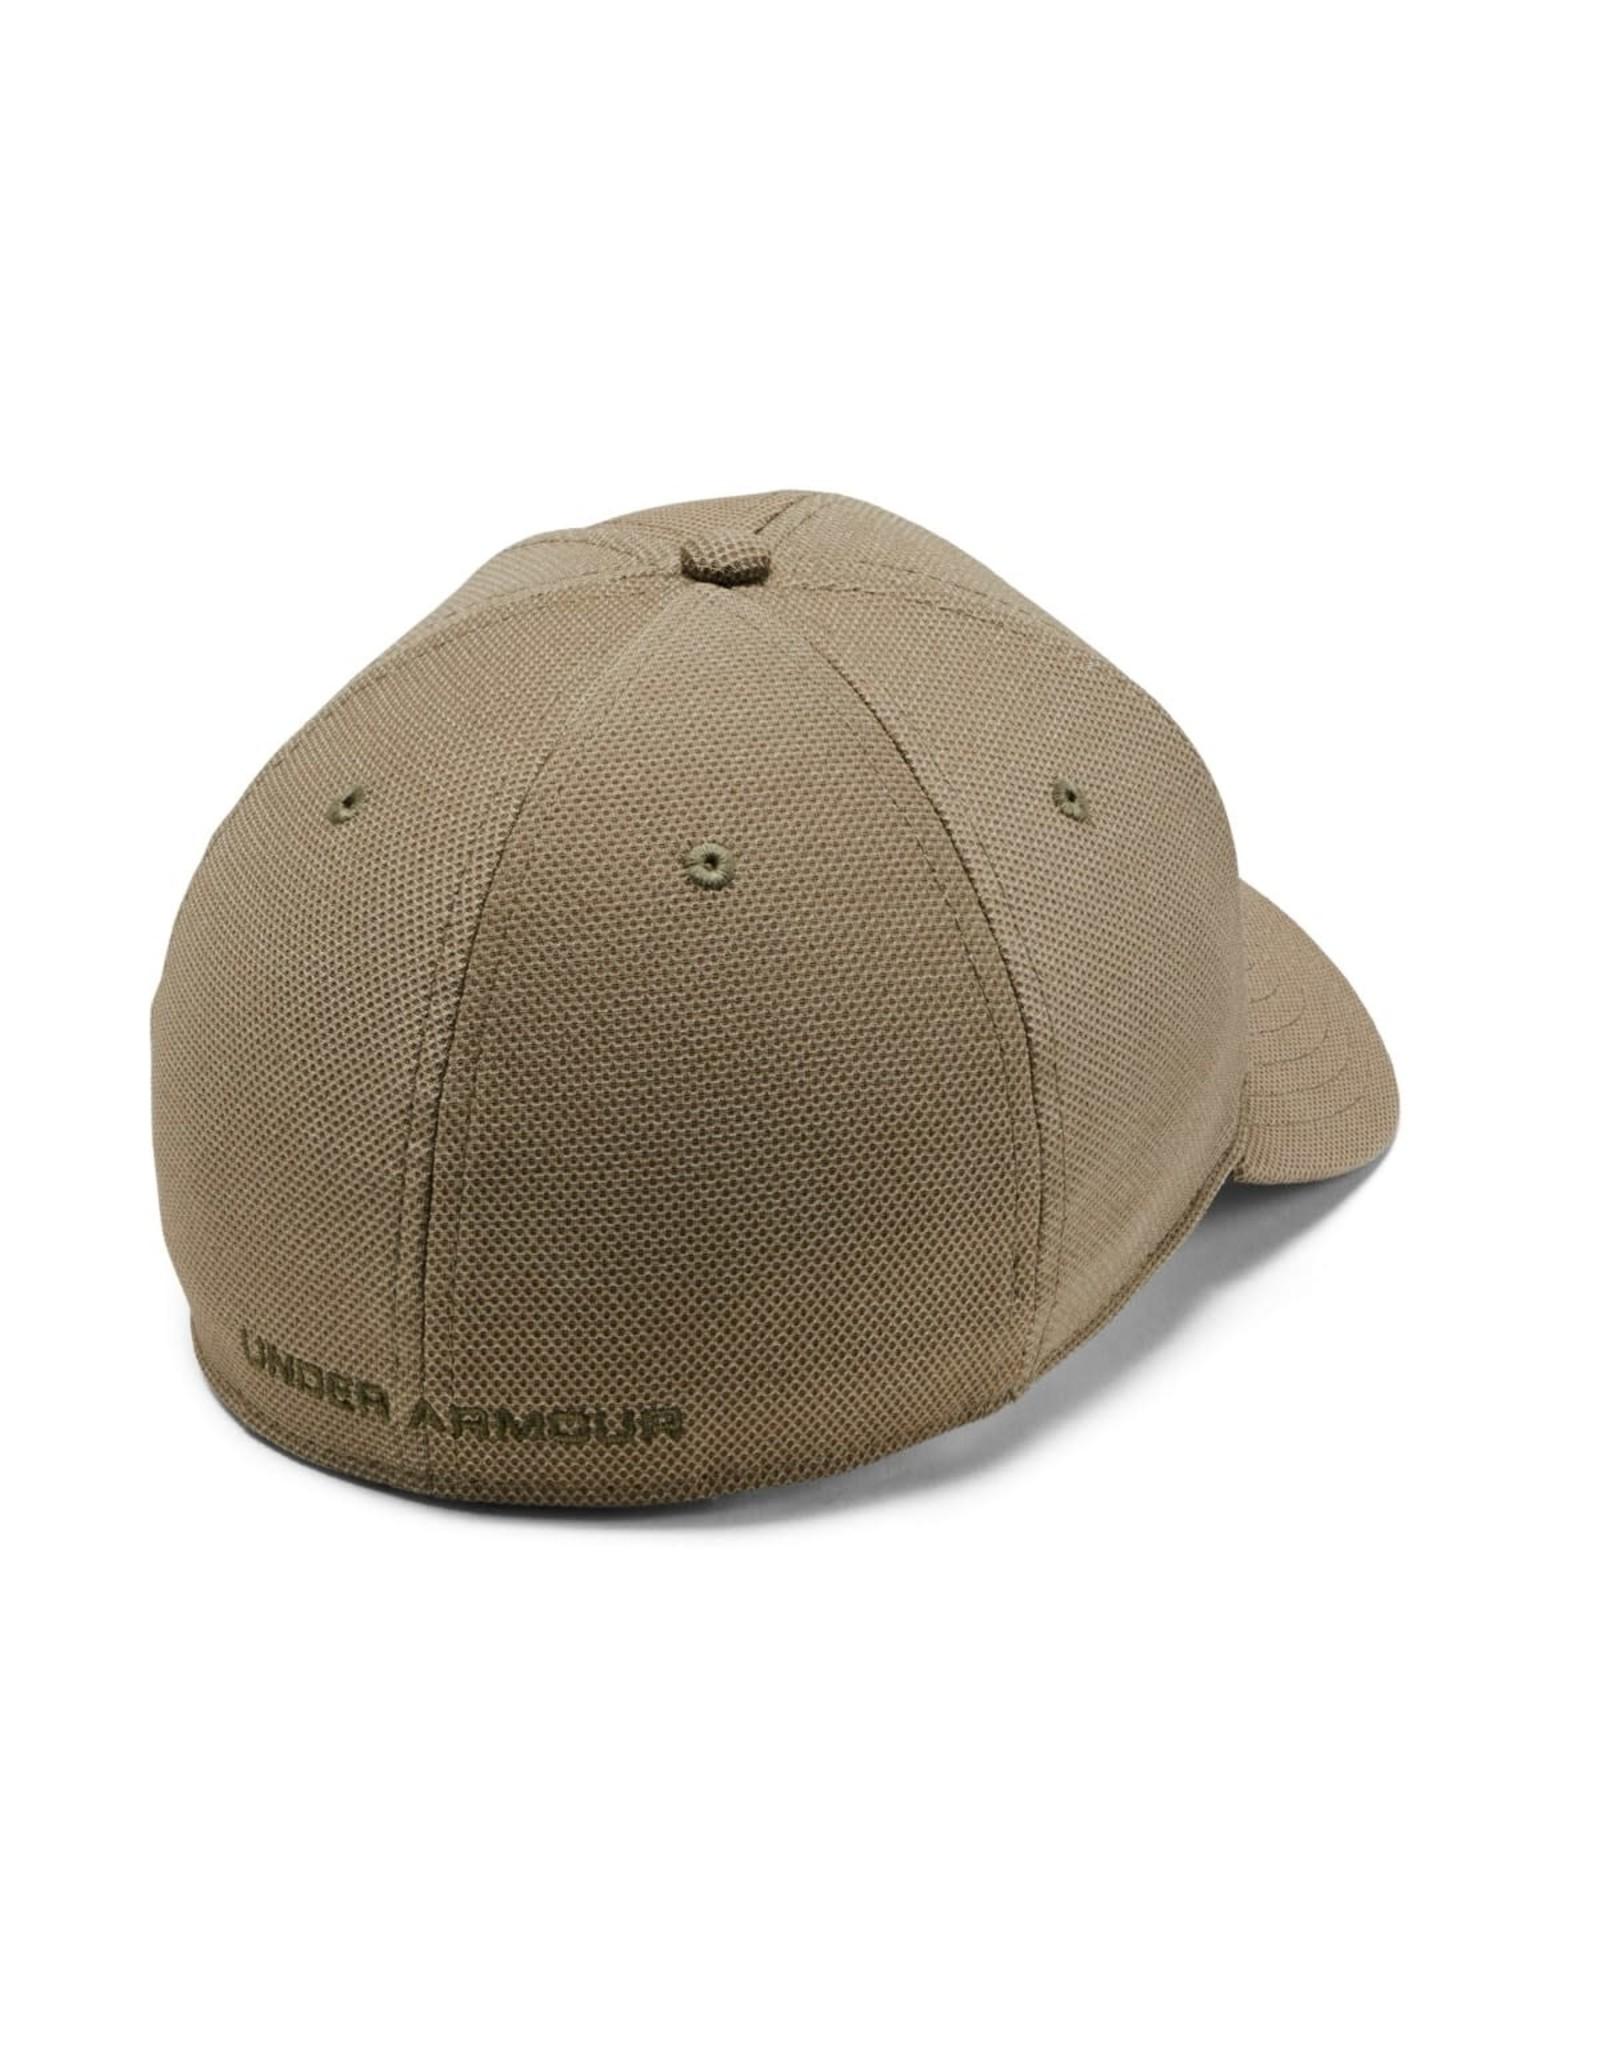 Under Armour Blitzing 3.0 Cap - brown